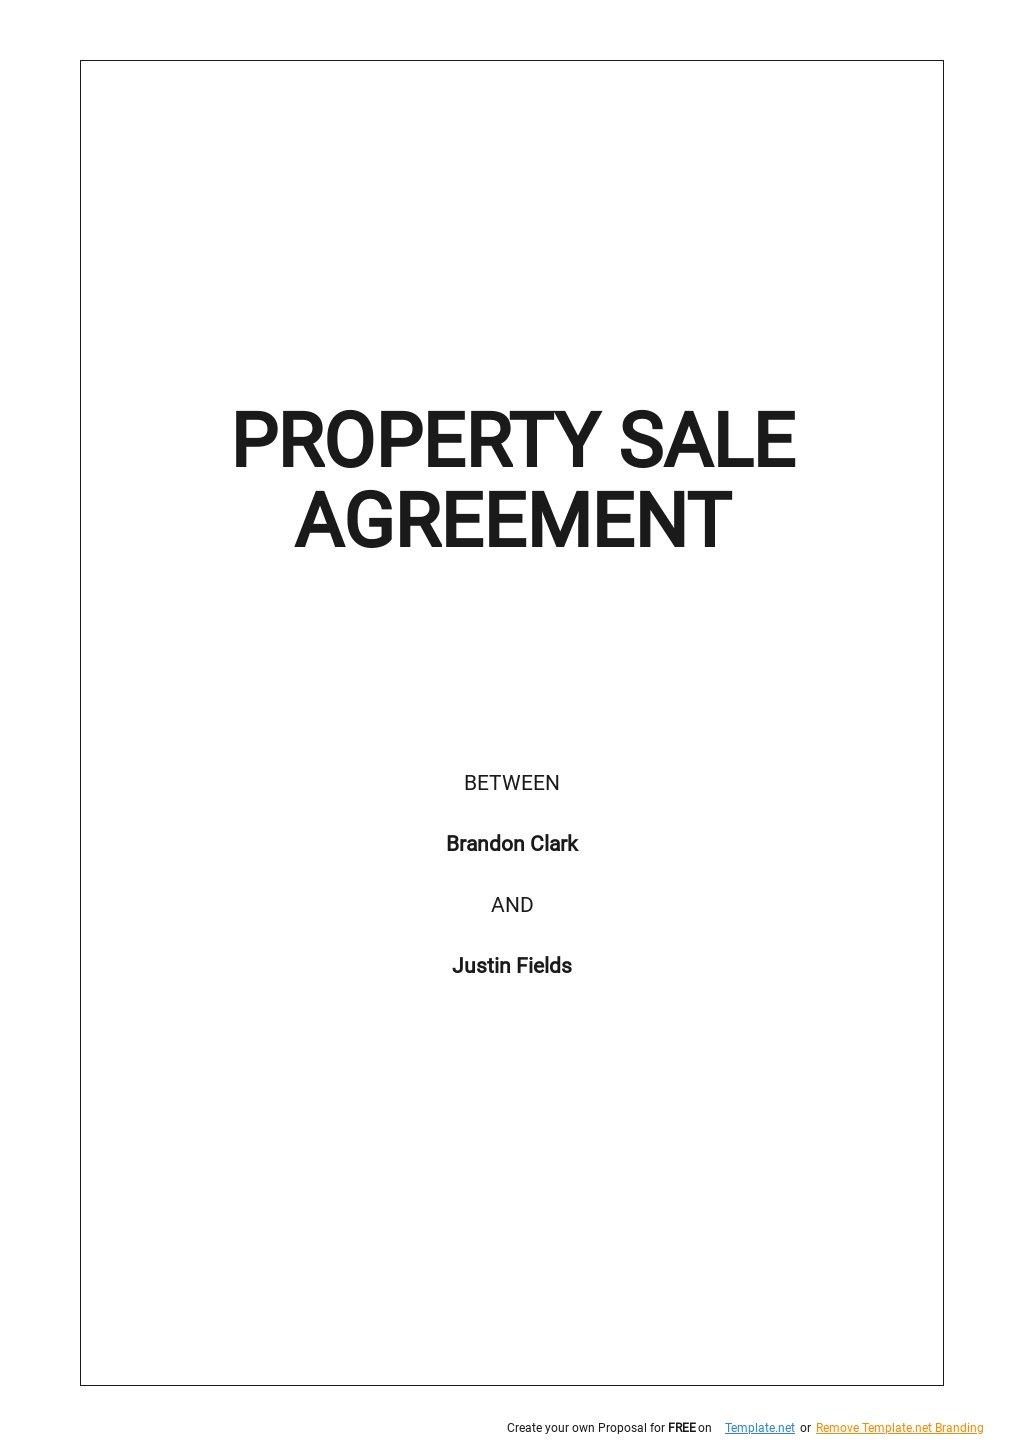 Property Sale Agreement Template.jpe